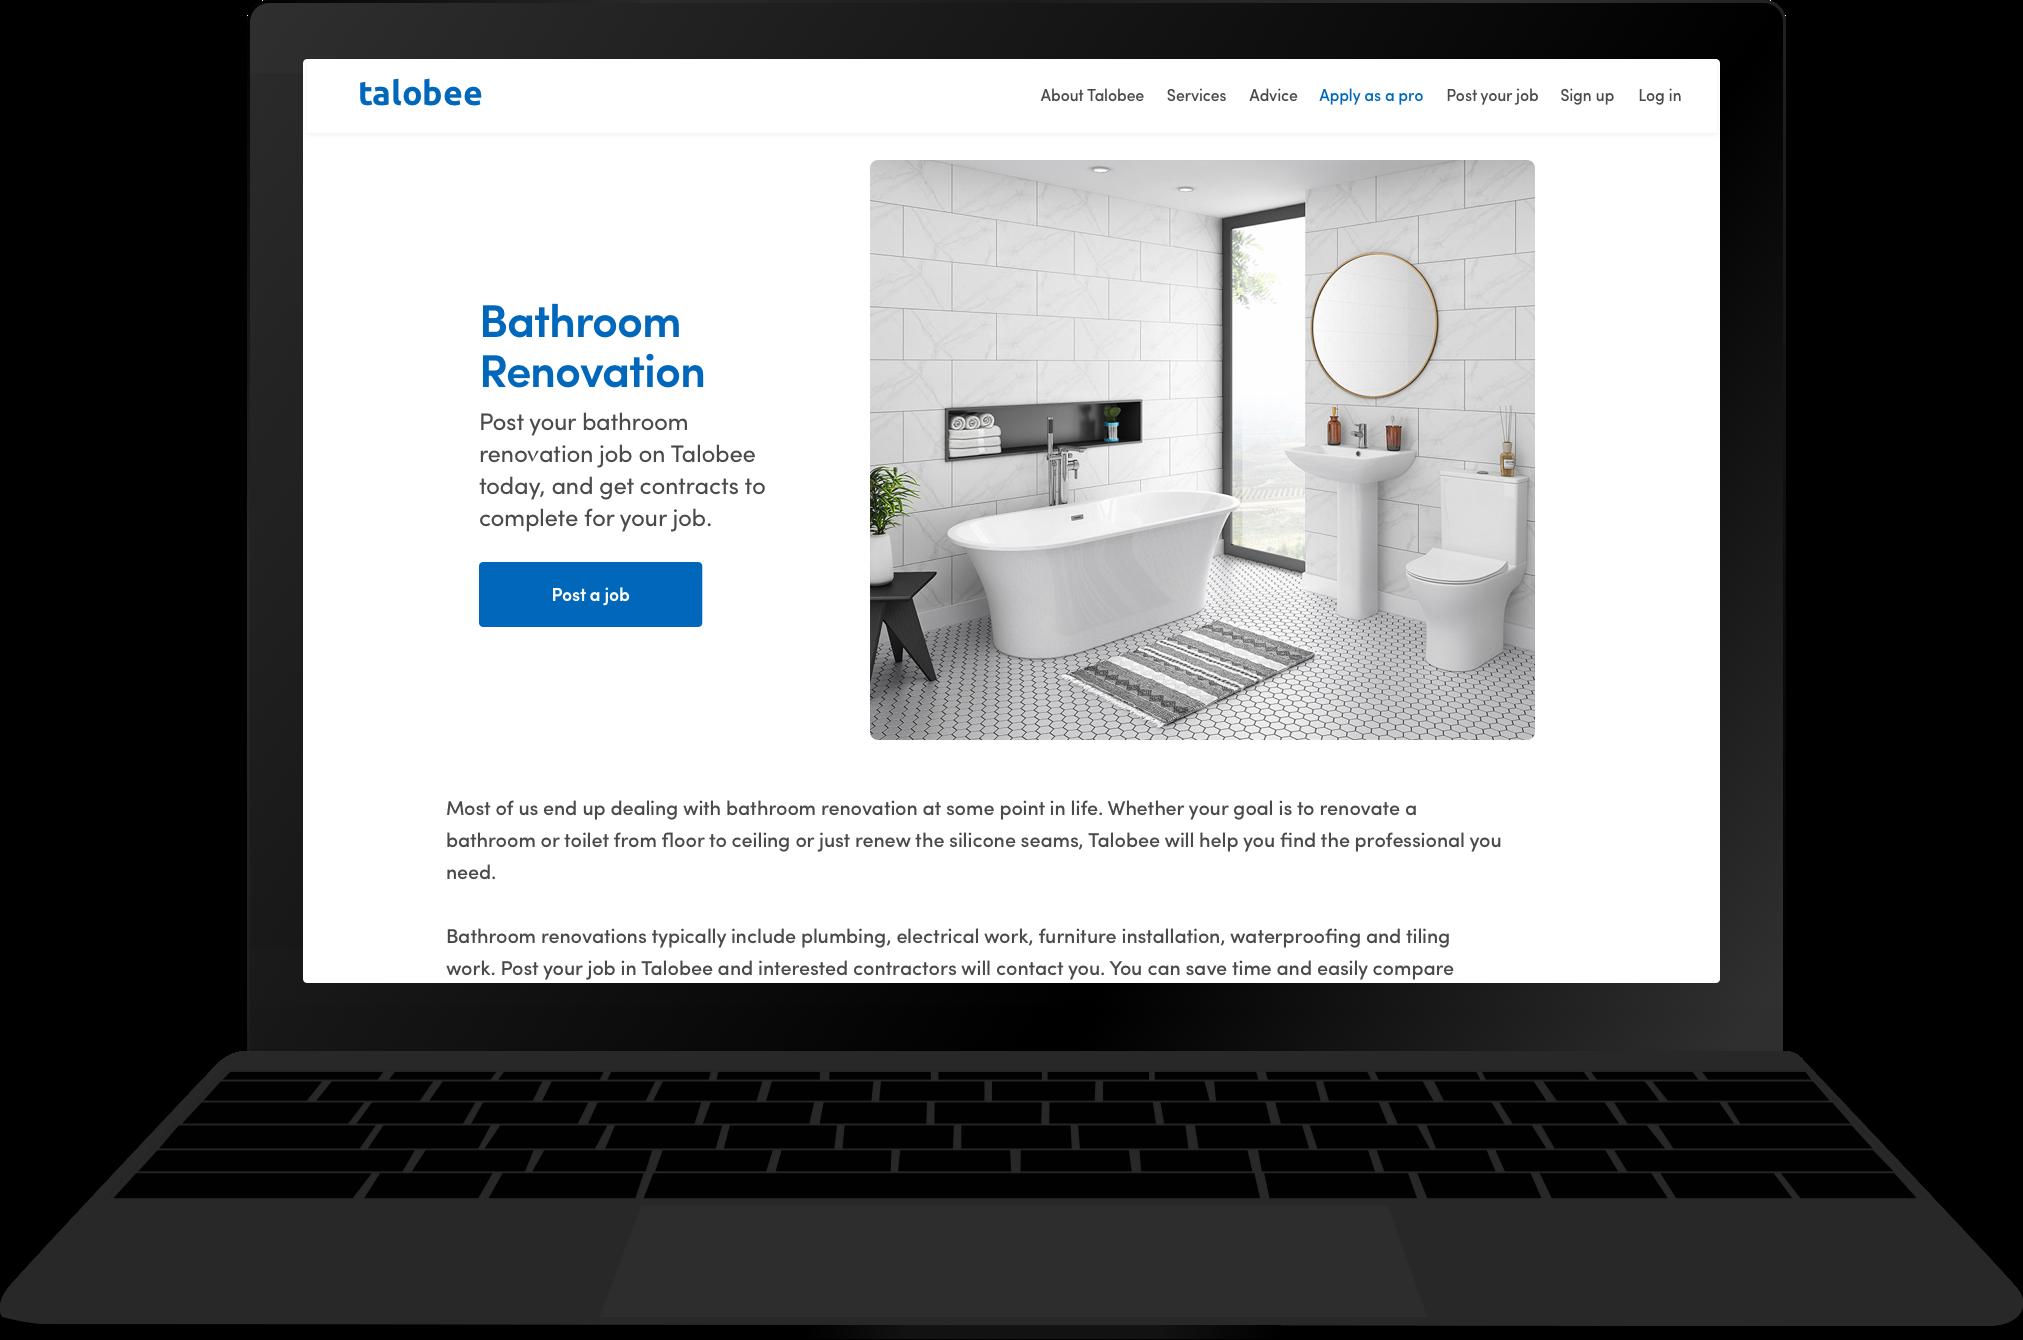 Mockup of the Talobee website on a macbook screen